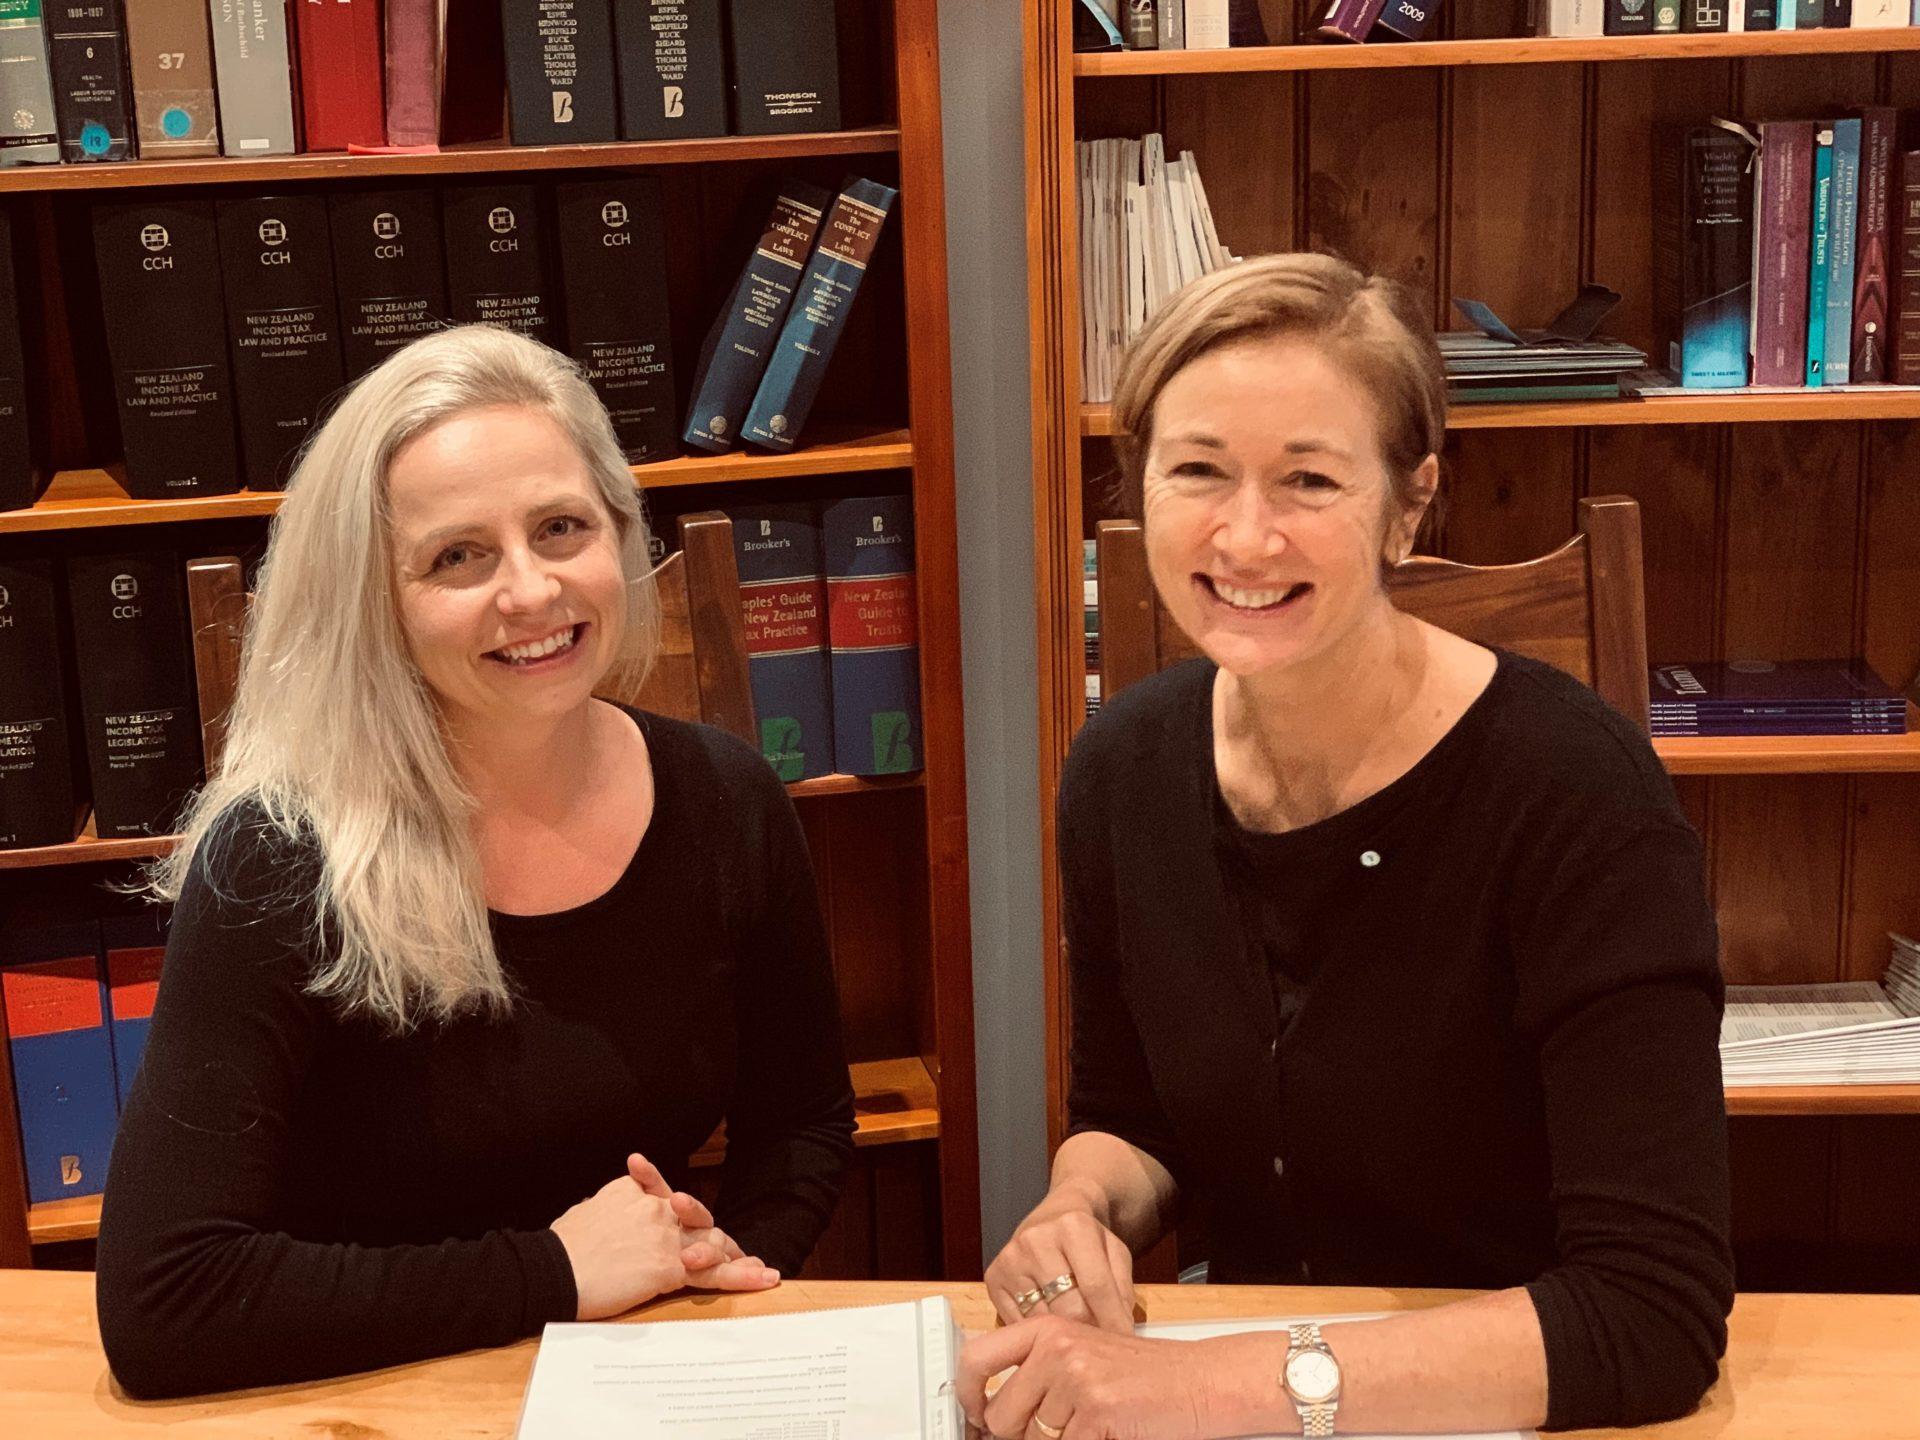 Caritas Pro Vitae Gradu - Ariane Slinger - Karen Marshall and Sharada Shaw